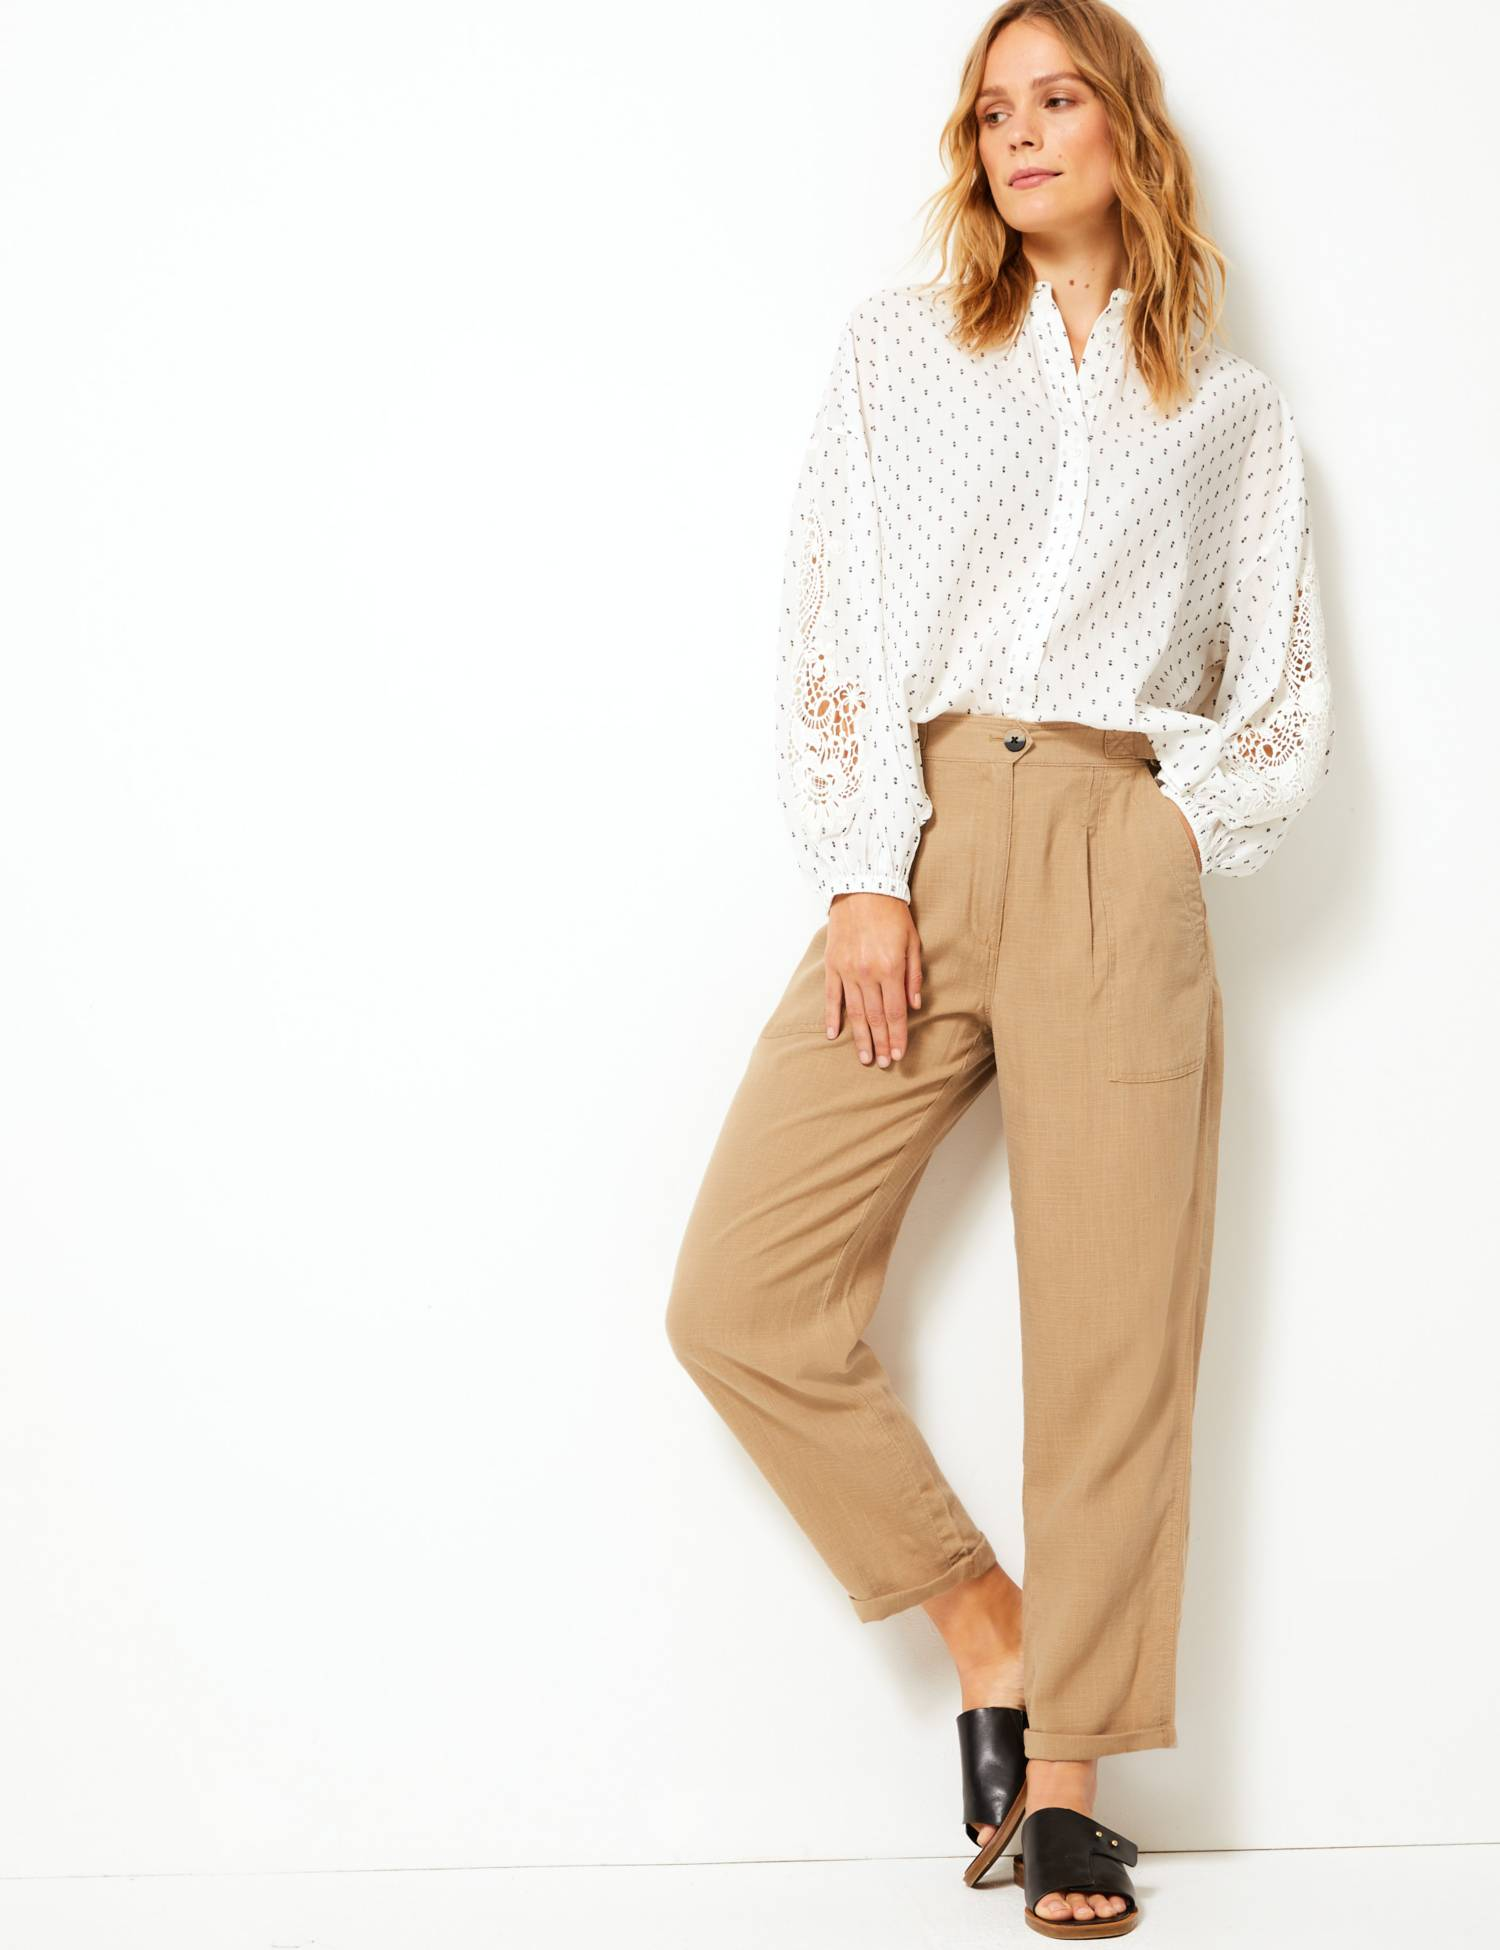 M&S Linen Blend Ankle Grazer Peg Trousers £35